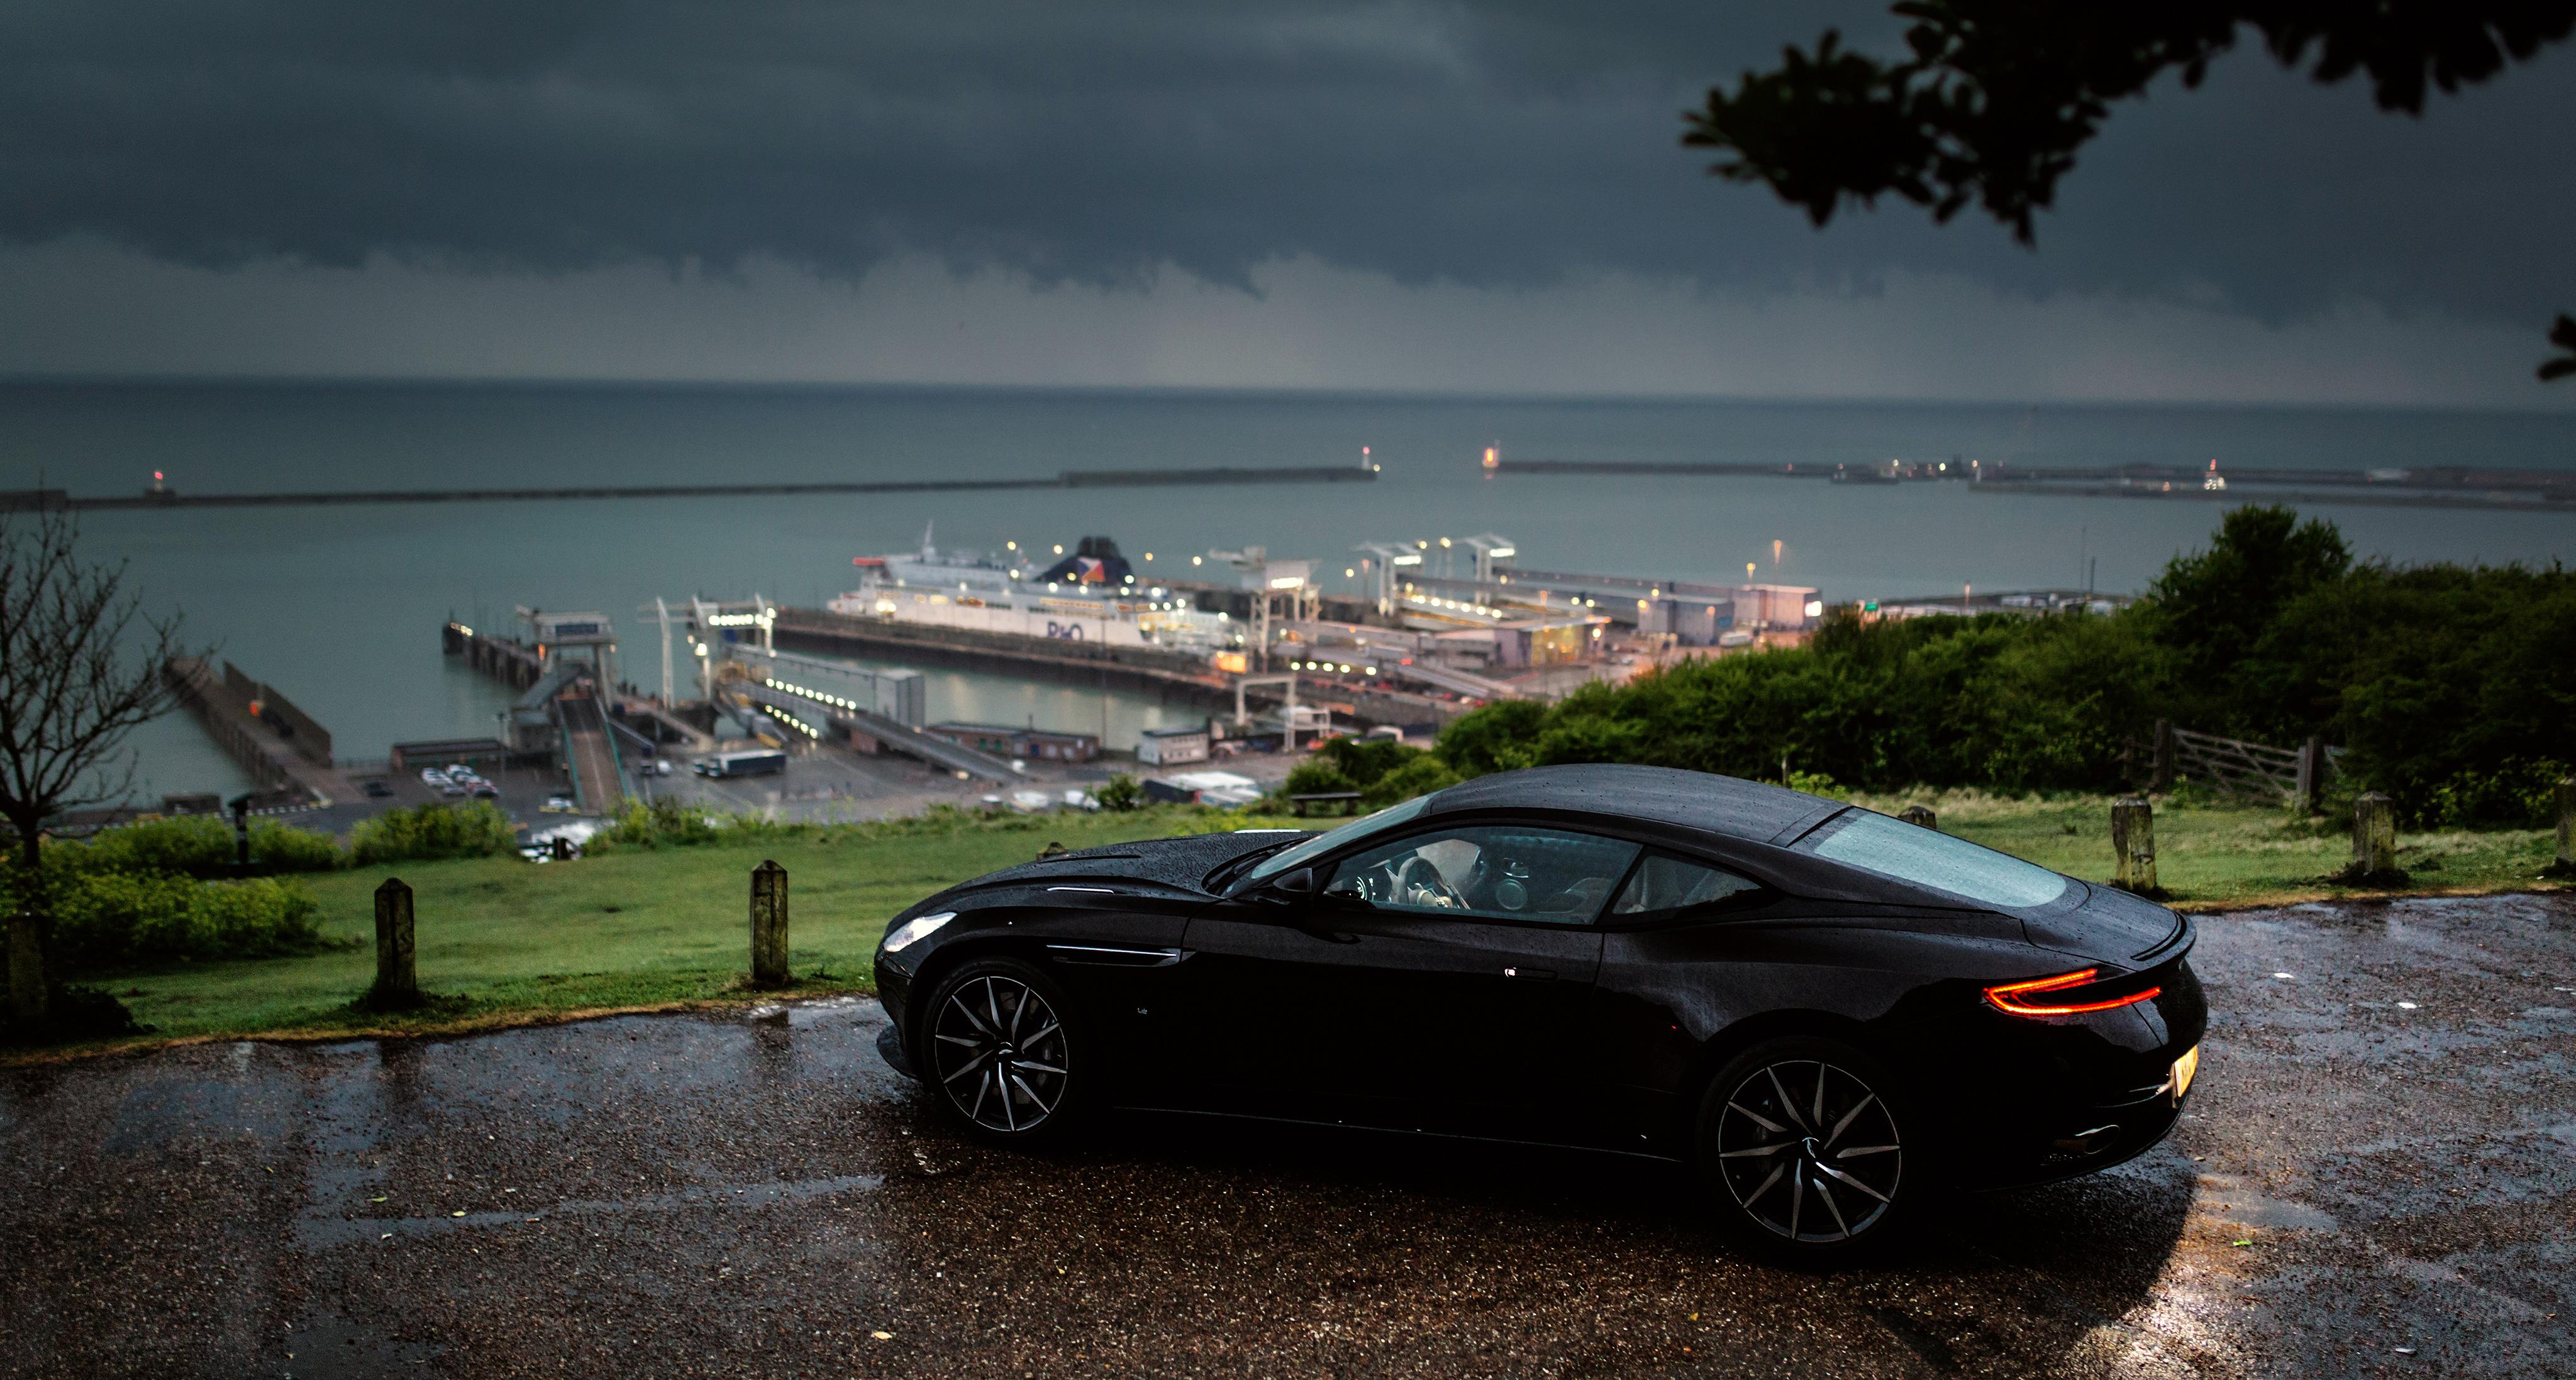 Aston Martin Db11 Rain Outside In Nature Hd Cars 4k